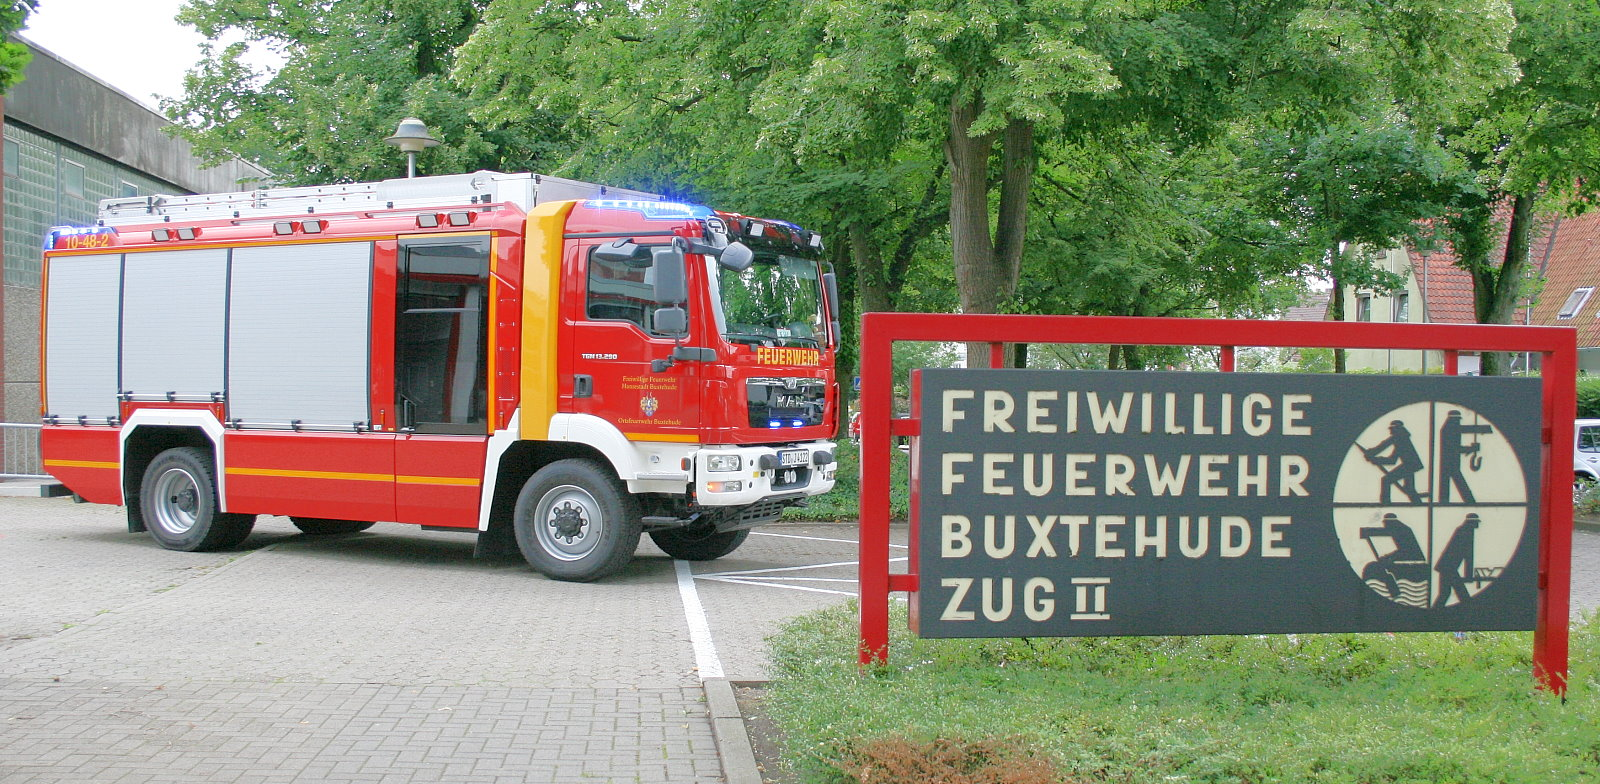 http://feuerwehr-buxtehude.de/media/img/bilder_ow_bu2/bilder_bu2_fa/hlf/005.JPG